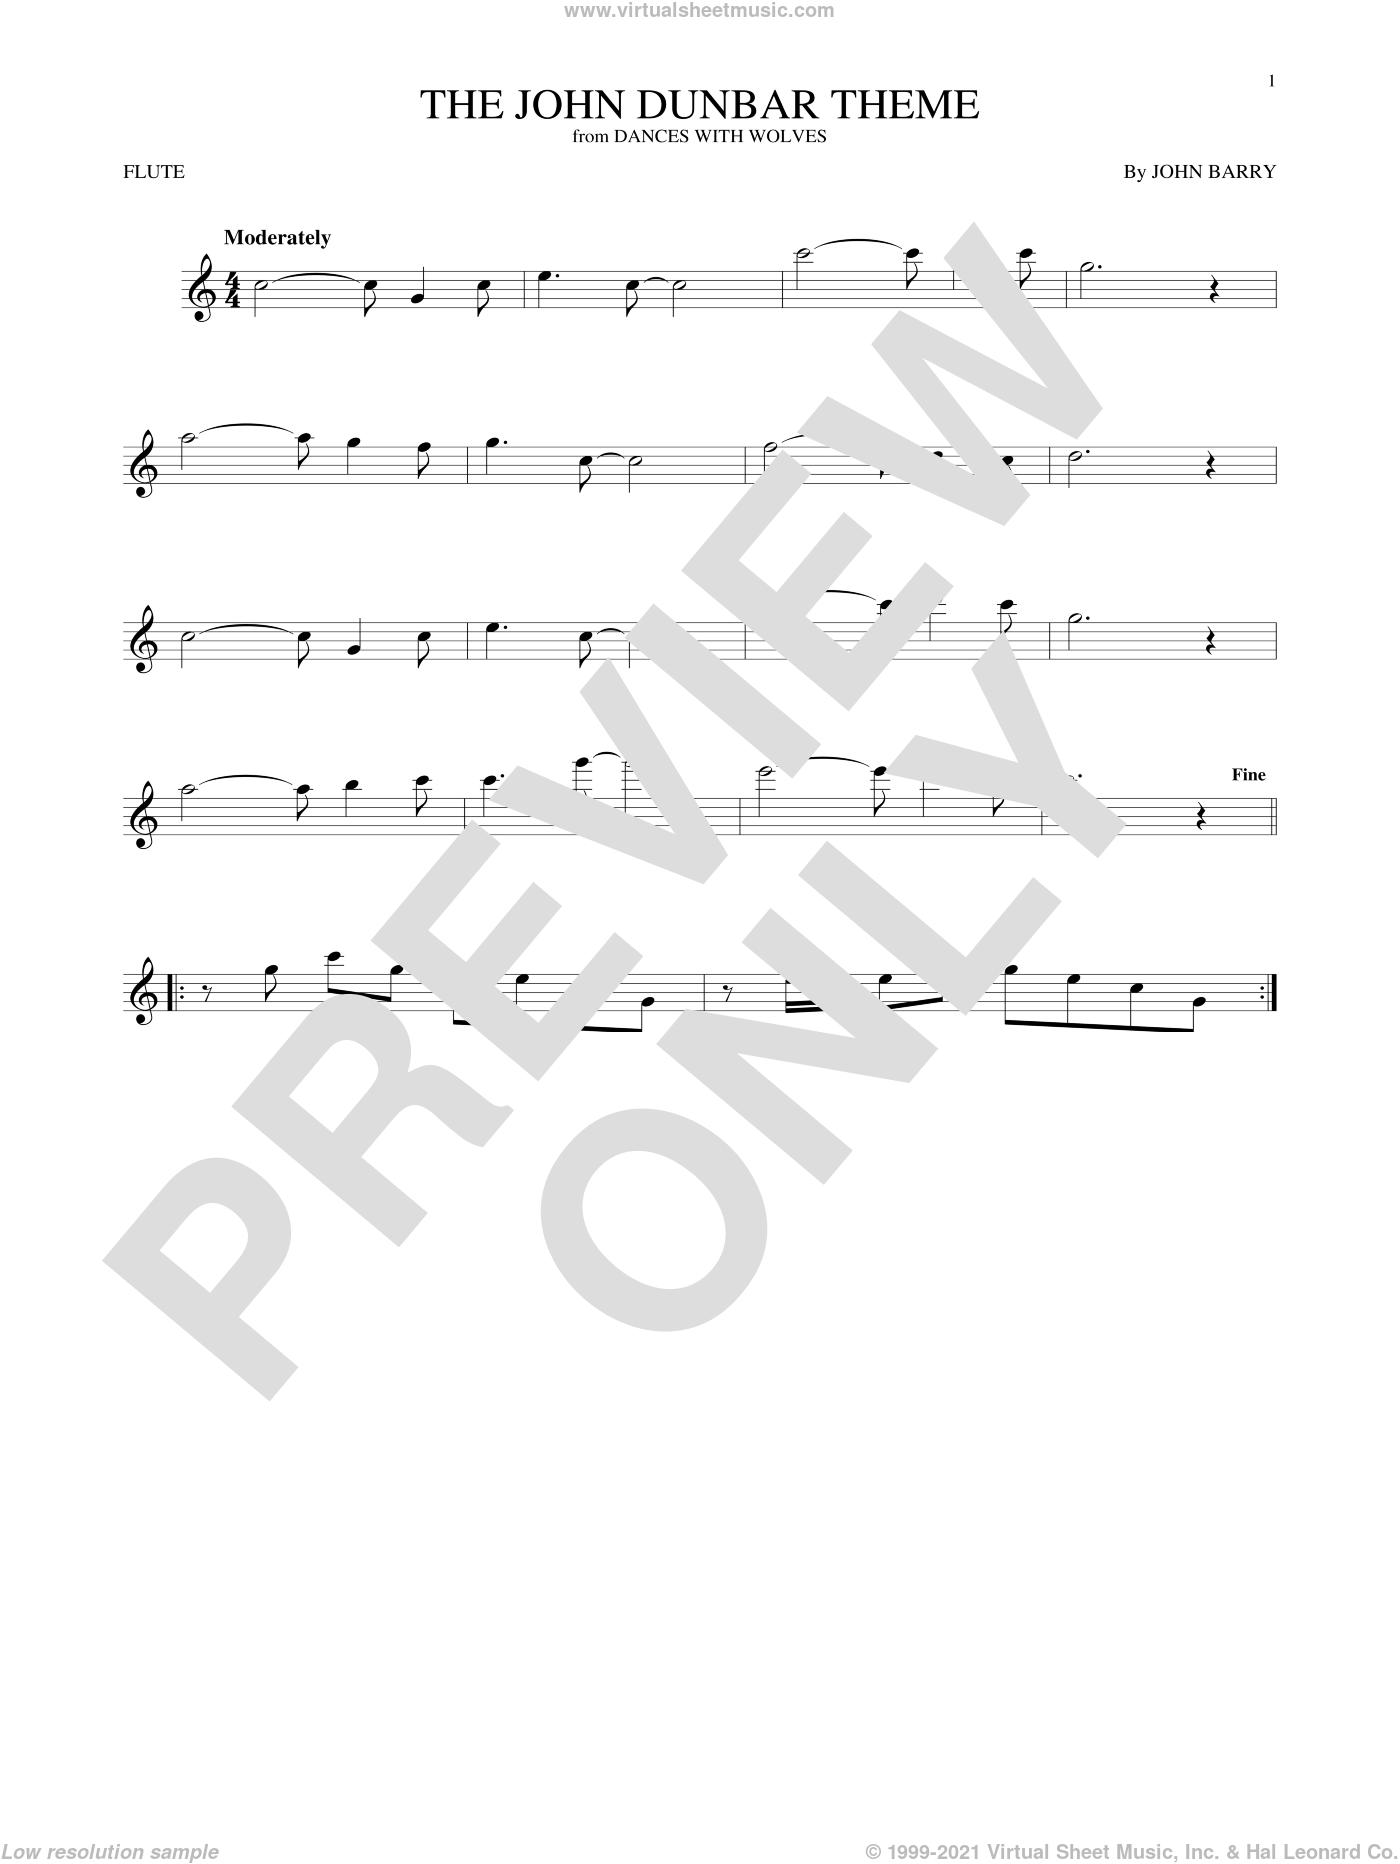 The John Dunbar Theme sheet music for flute solo by John Barry, intermediate skill level